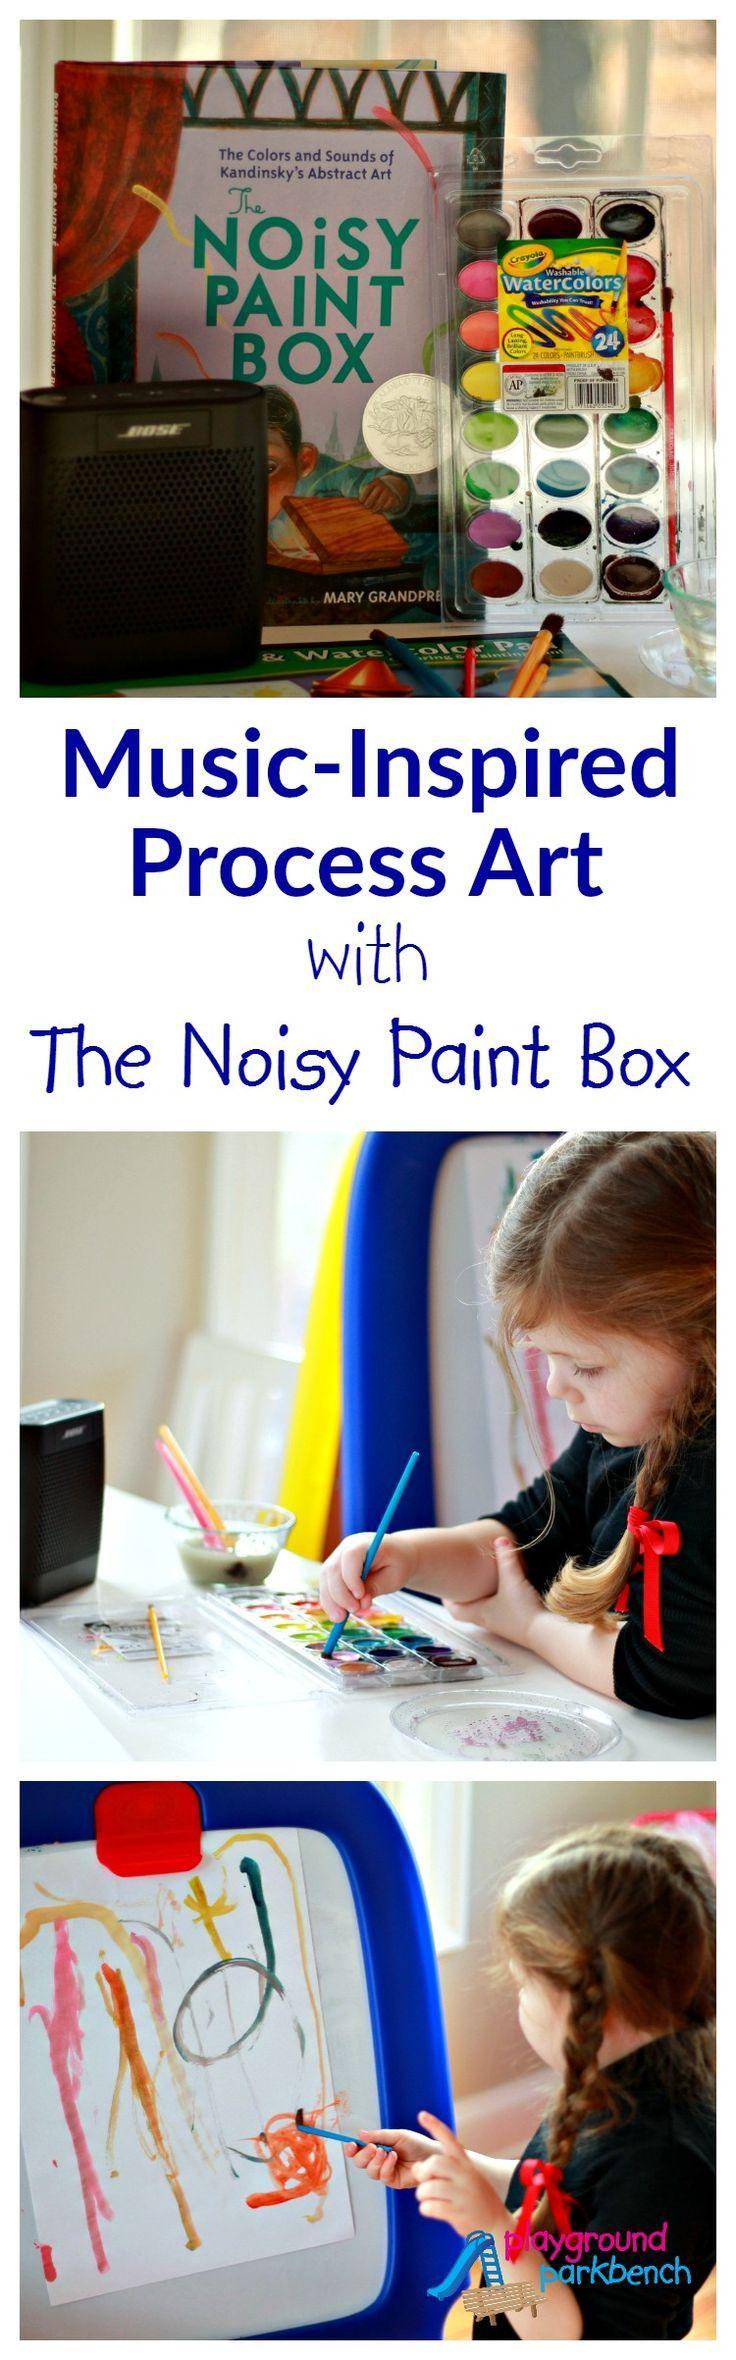 The Noisy Paint Box Process Art #creativeartsfor2-3yearolds